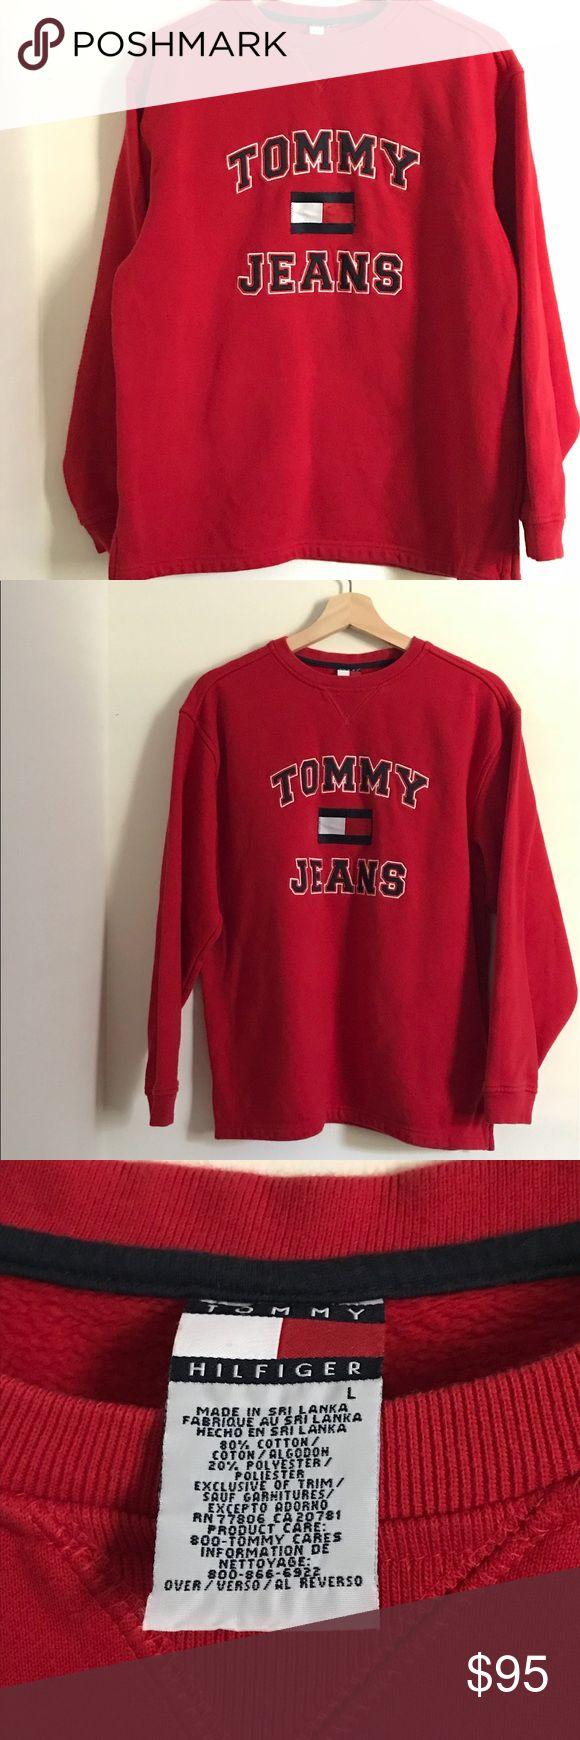 Original RED Tommy Hilfiger Sweater Men's RED Tommy